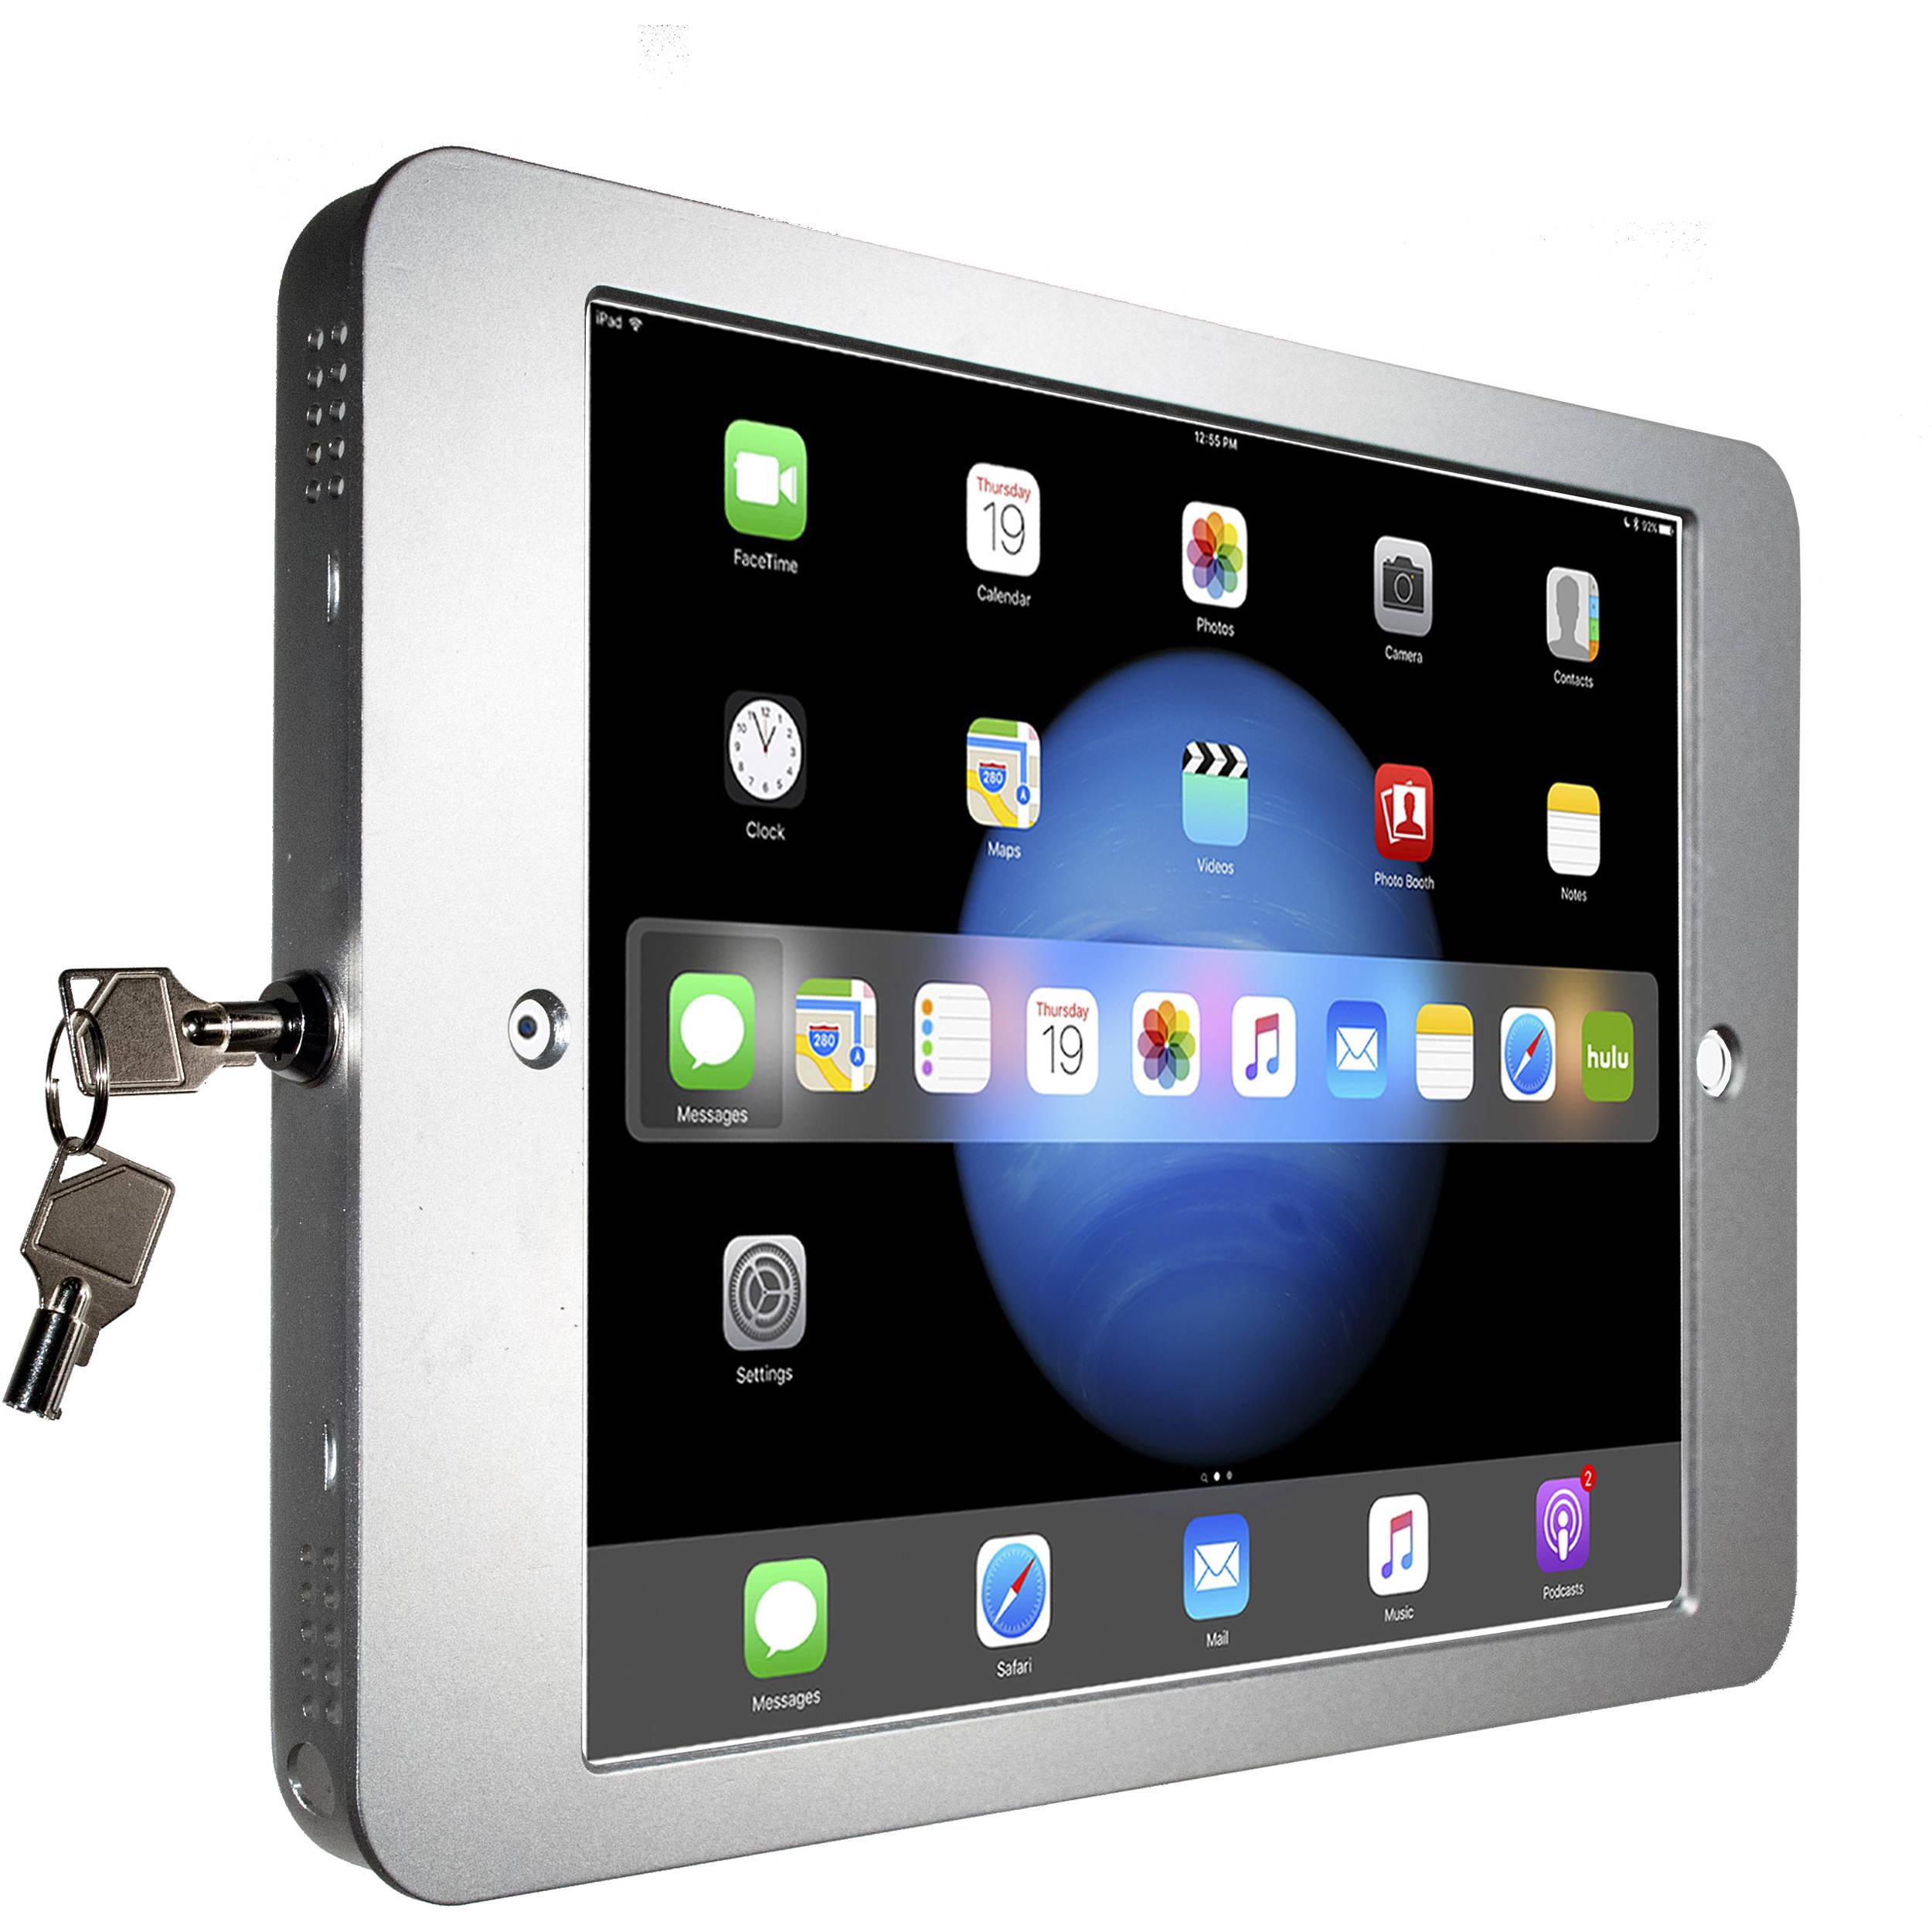 Cta Digital Security Wall Enclosure For Apple Ipad Pro Pad